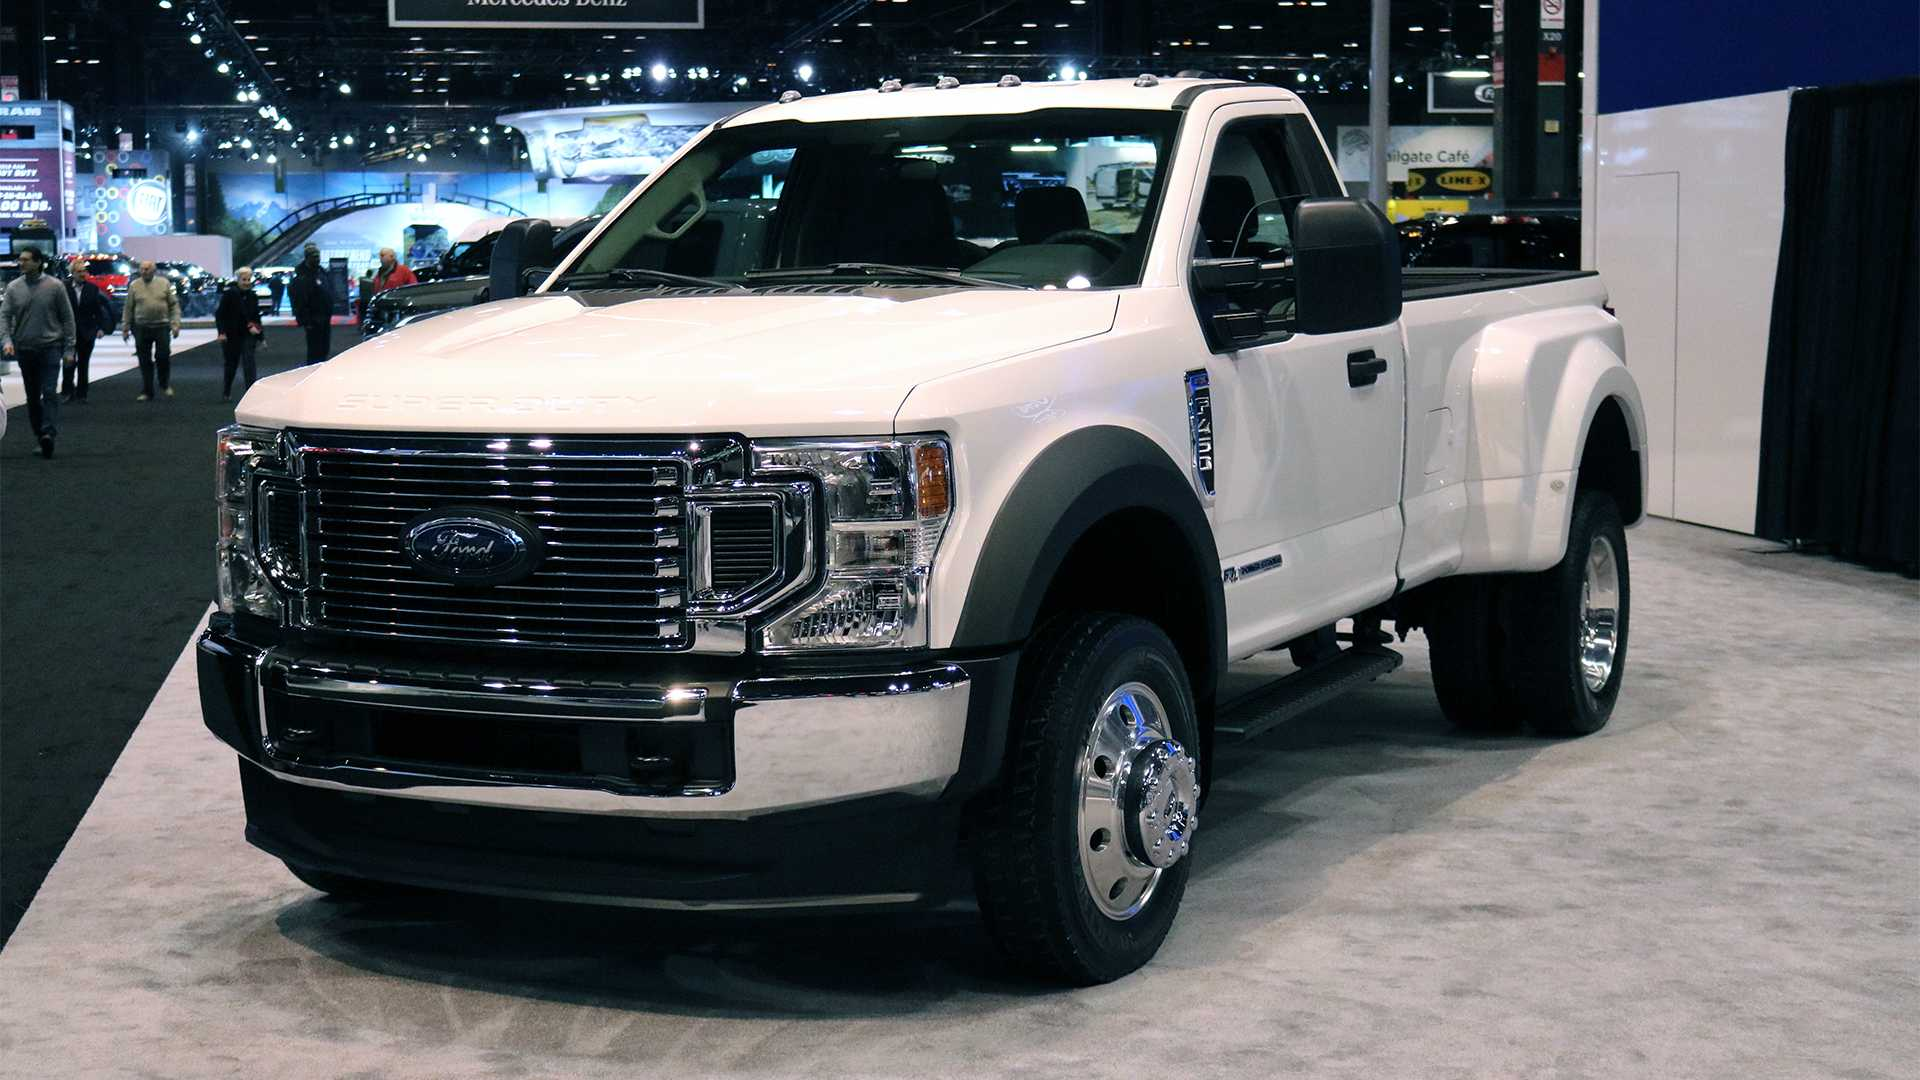 2020 Ford Super Duty มาพร้อมพลังเครื่องยนต์สุดโหด! V8 ขนาด ...